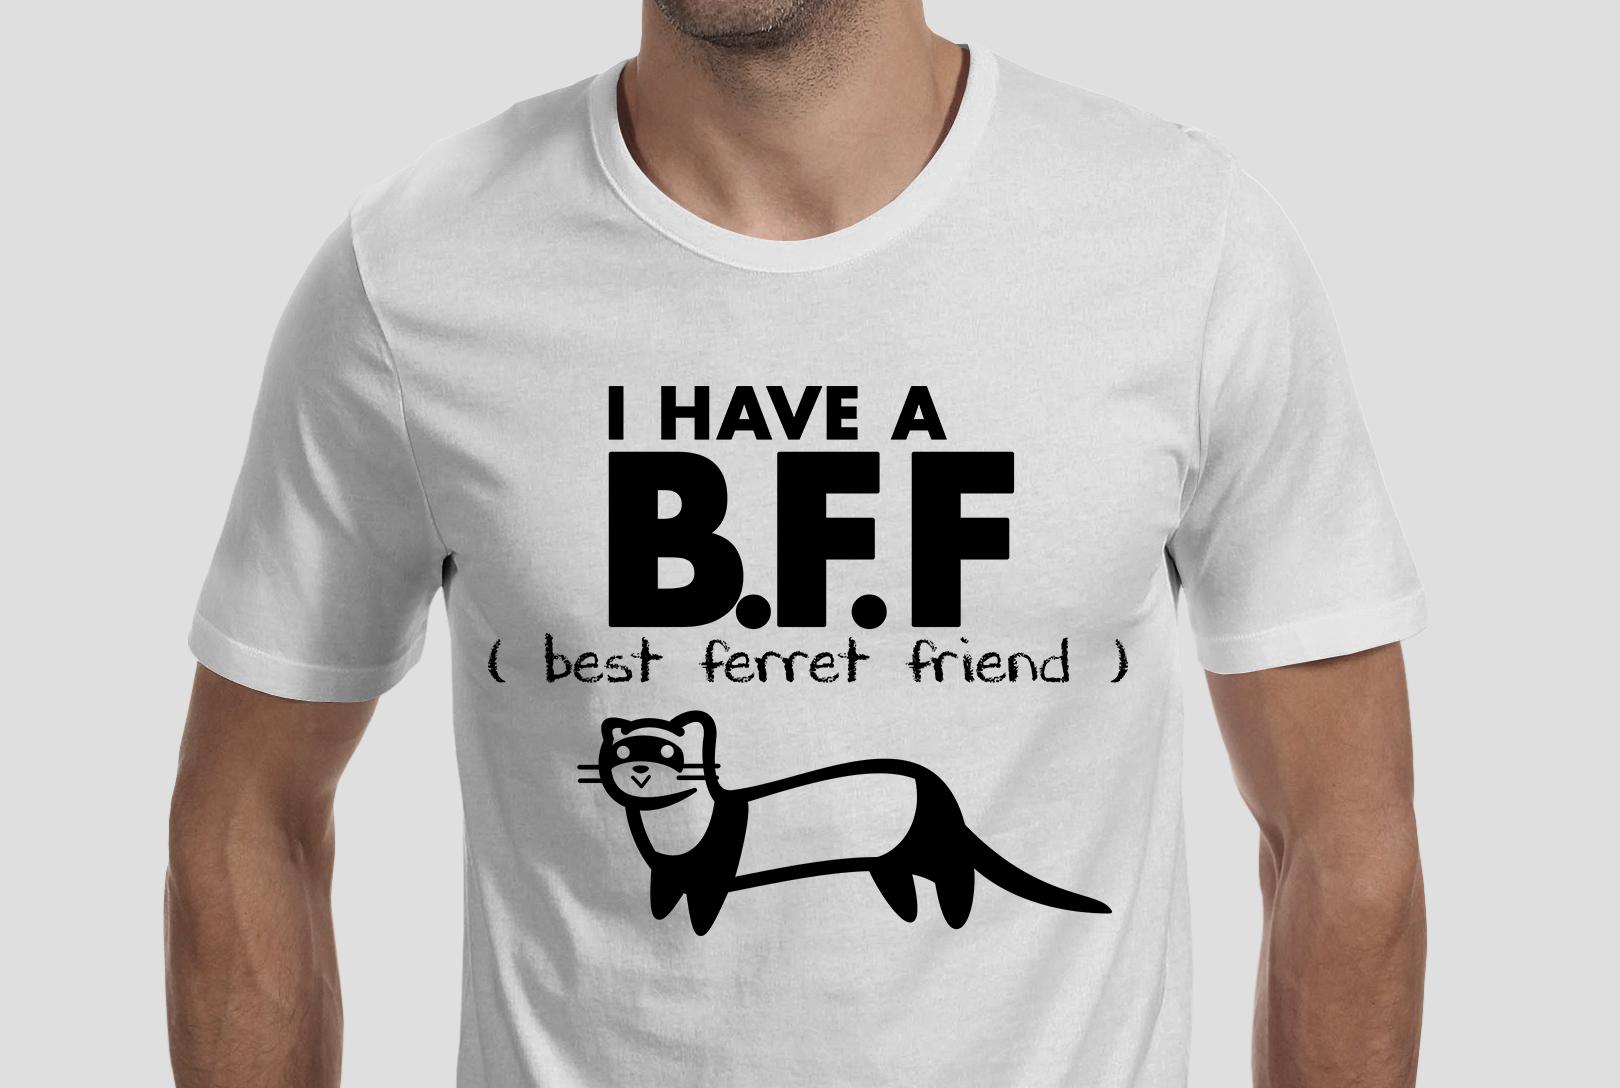 I will design a professional Teespring shirt